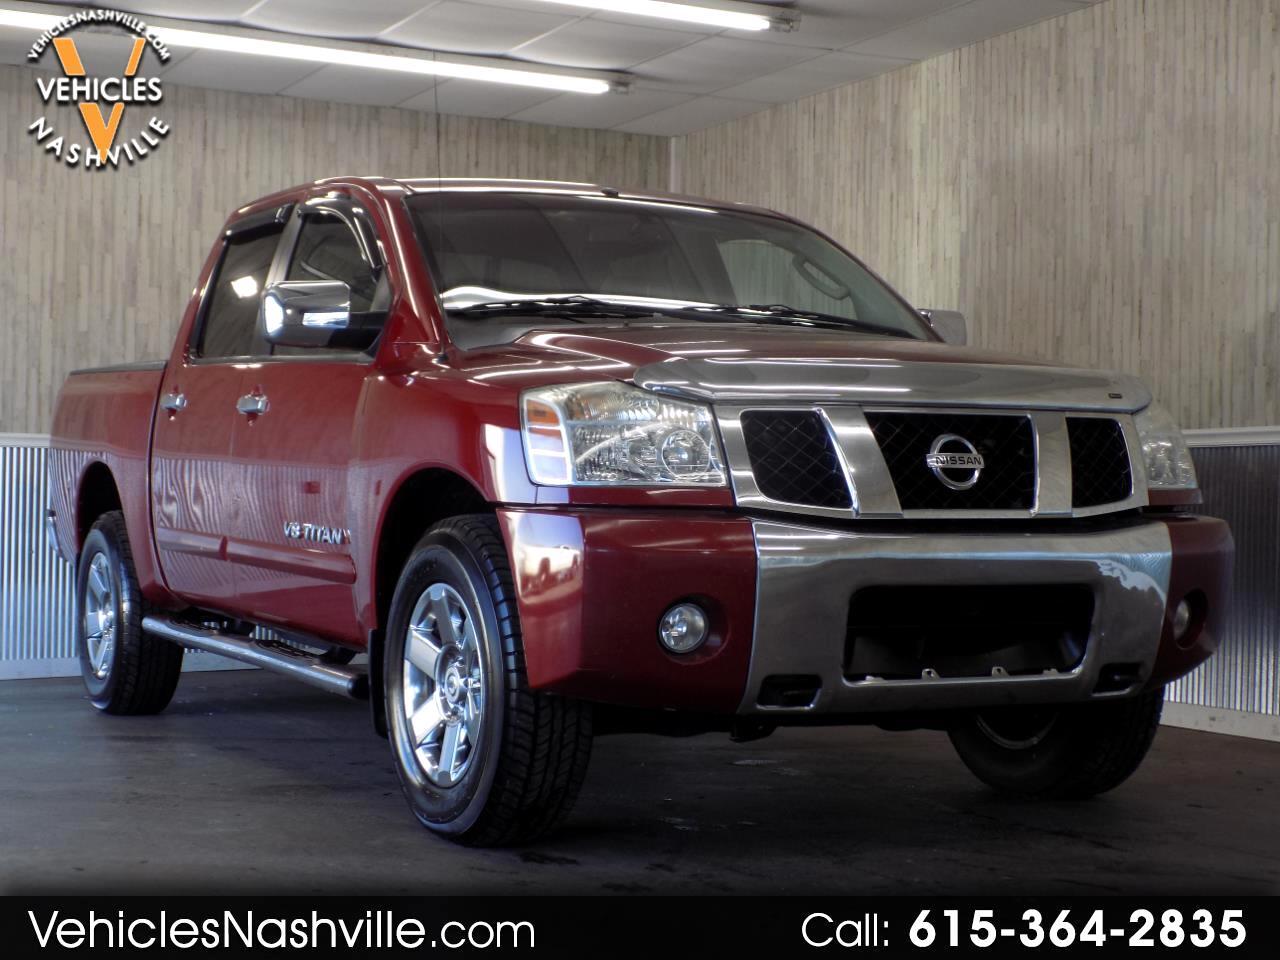 Used 2007 Nissan Titan 4wd Crew Cab Se For Sale In Nashville Tn 37210 Vehicles Nashville